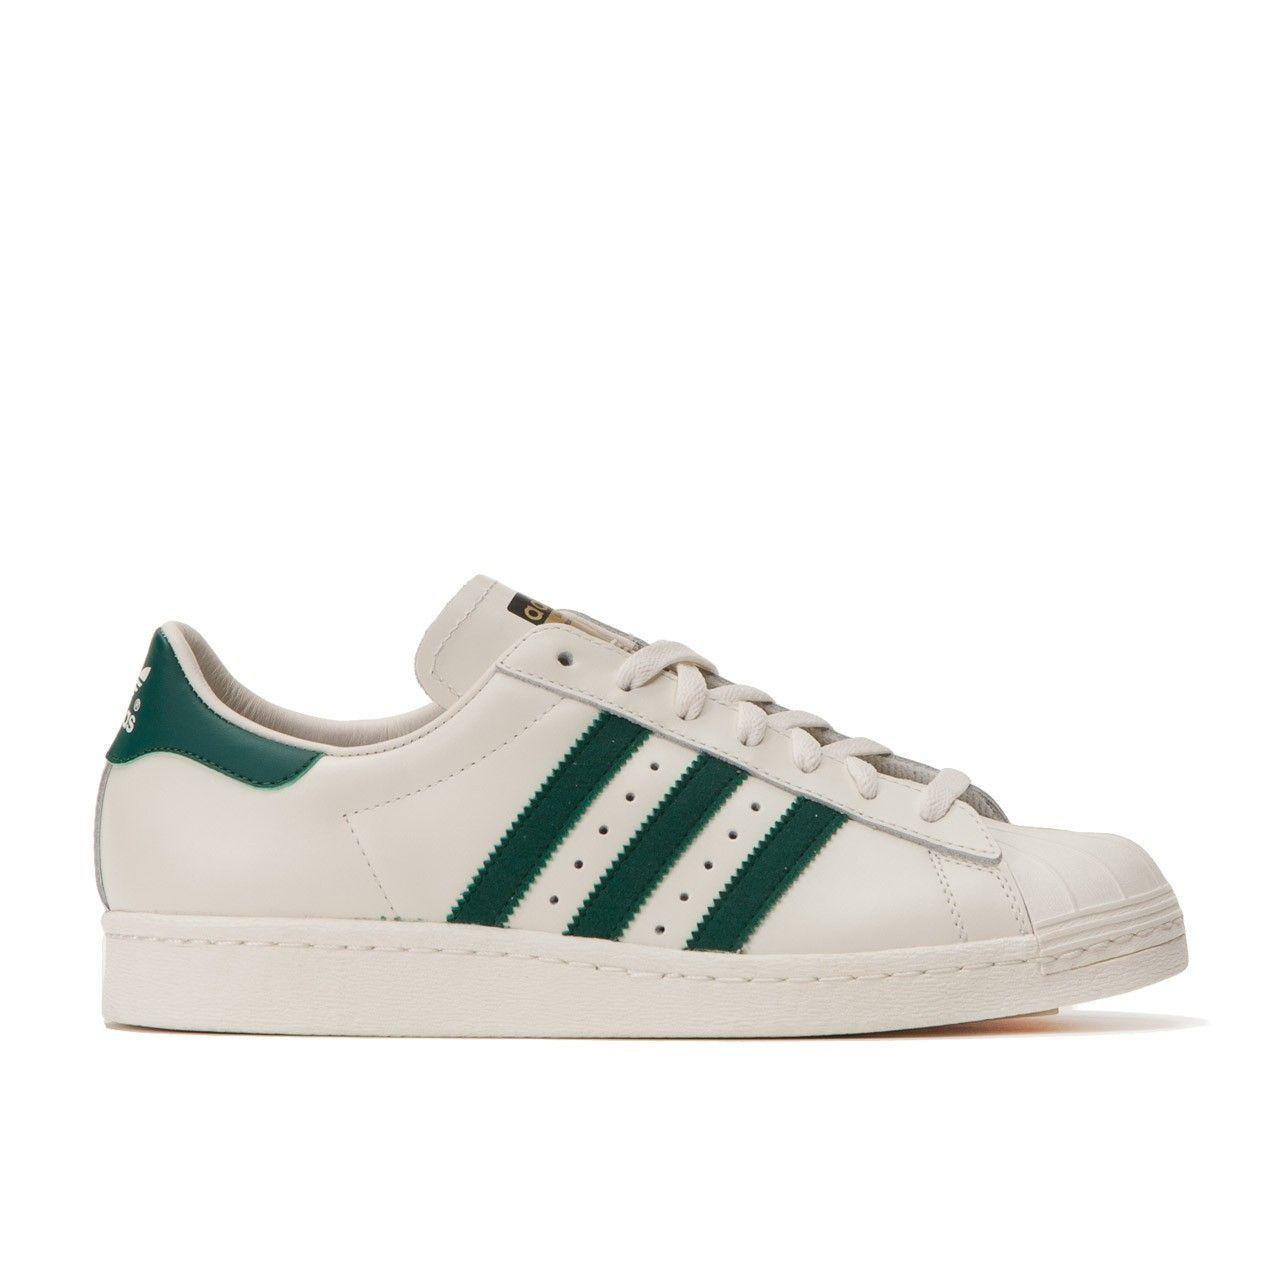 Adidas Superstar 80 S Dlx Weiss Grun Adidas Superstar Adidas Sneaker Marken